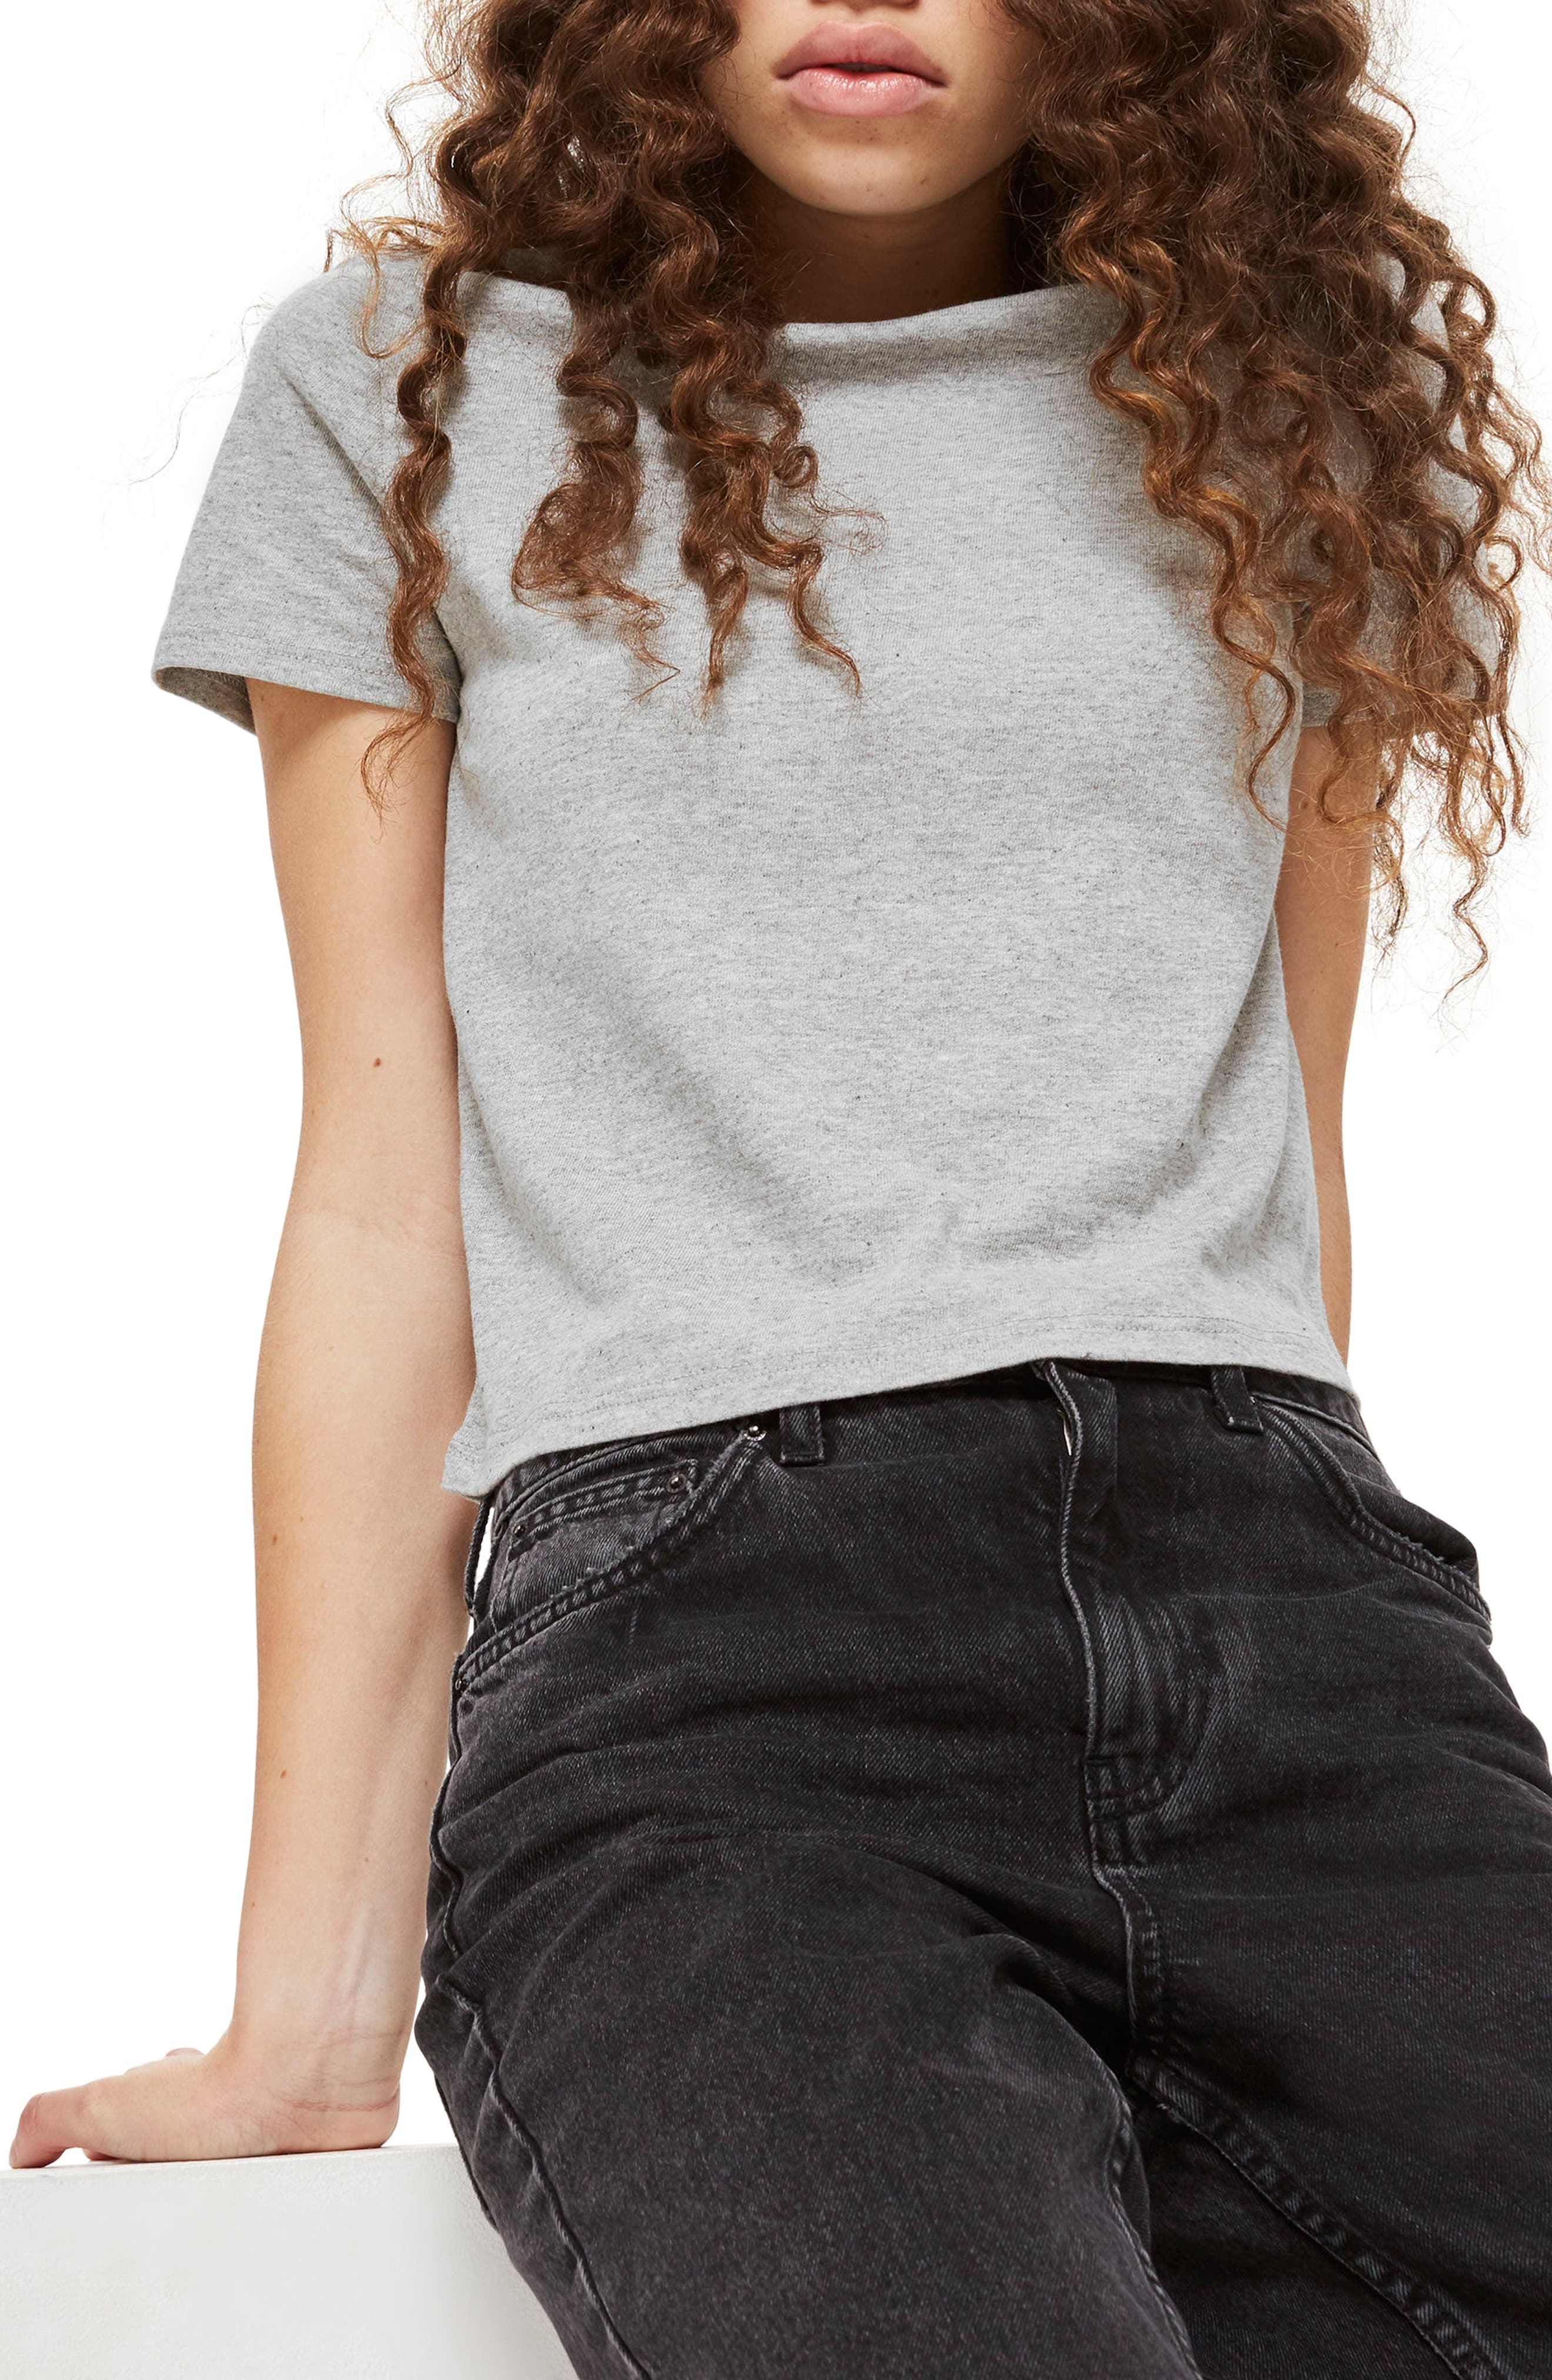 Topshop Basic Crop T-Shirt (2 for $18)